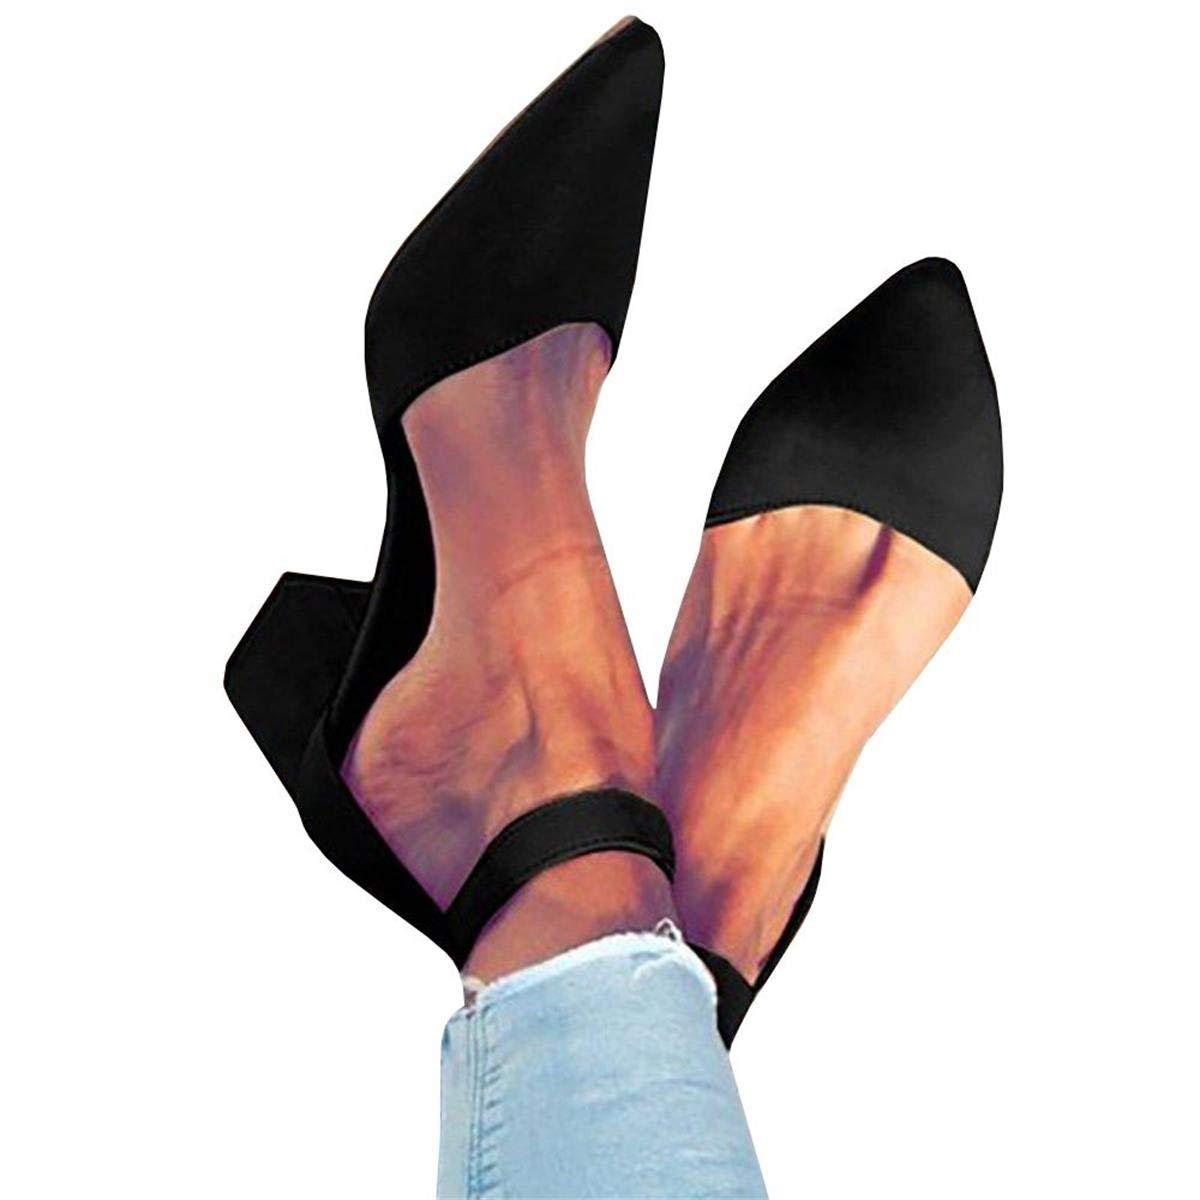 Damen Blockabsatz Mary Janes Schuhe Knöchelriemchen Wies Wildleder Pumps Mid Heel Geschlossener Zeh Sommerschuhe, Schwarz, 38 EU